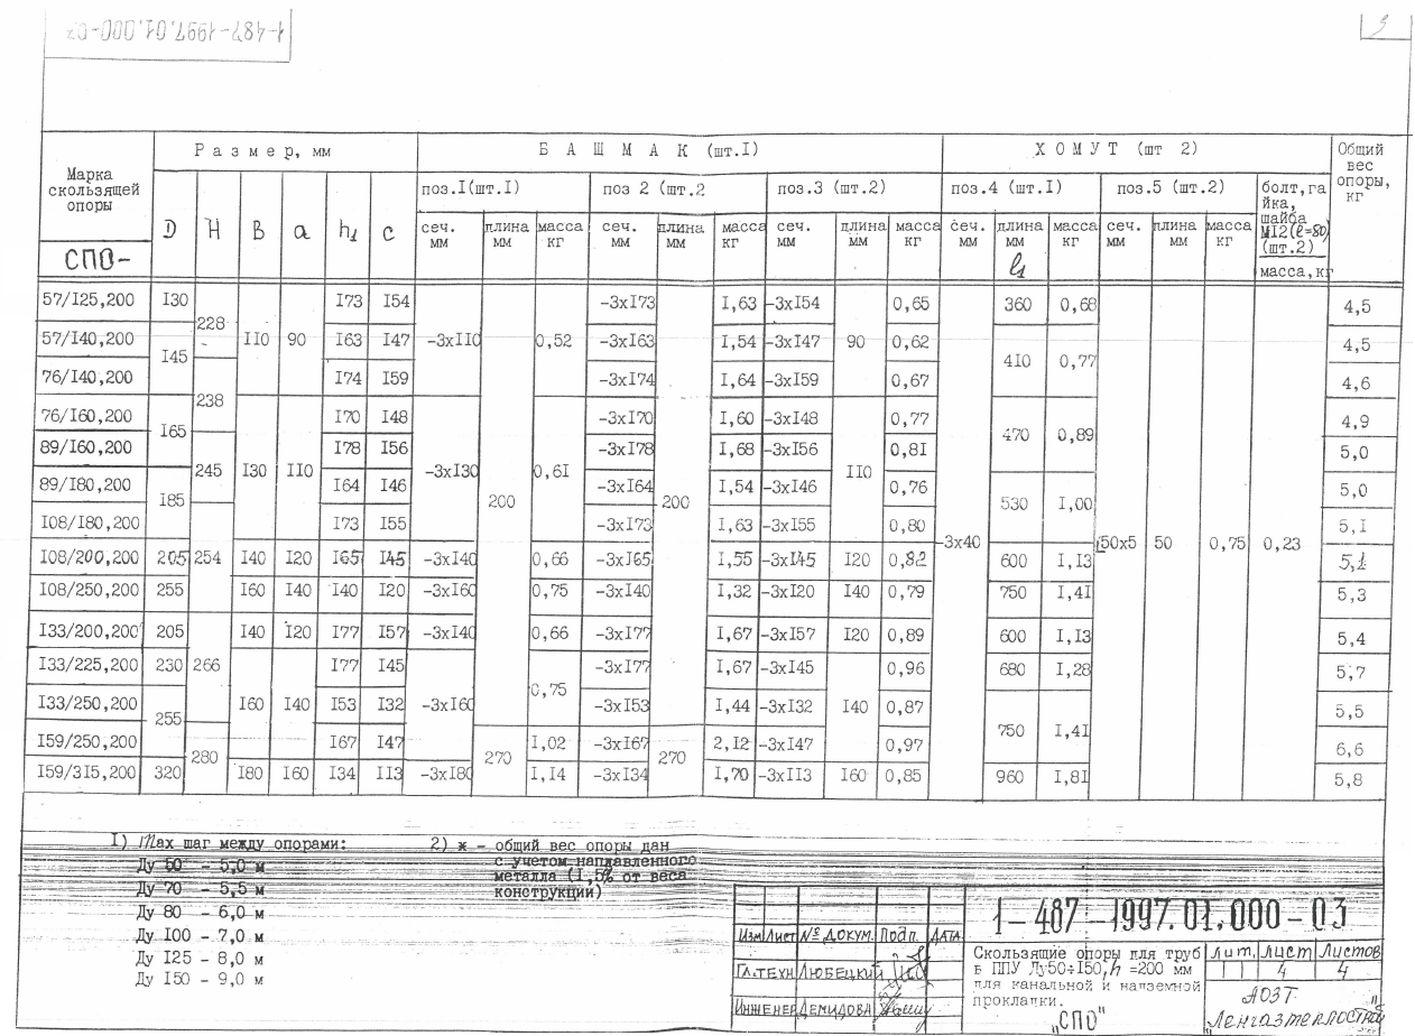 Опоры СПО ТД 1-487-1997.01.000-03 стр.4